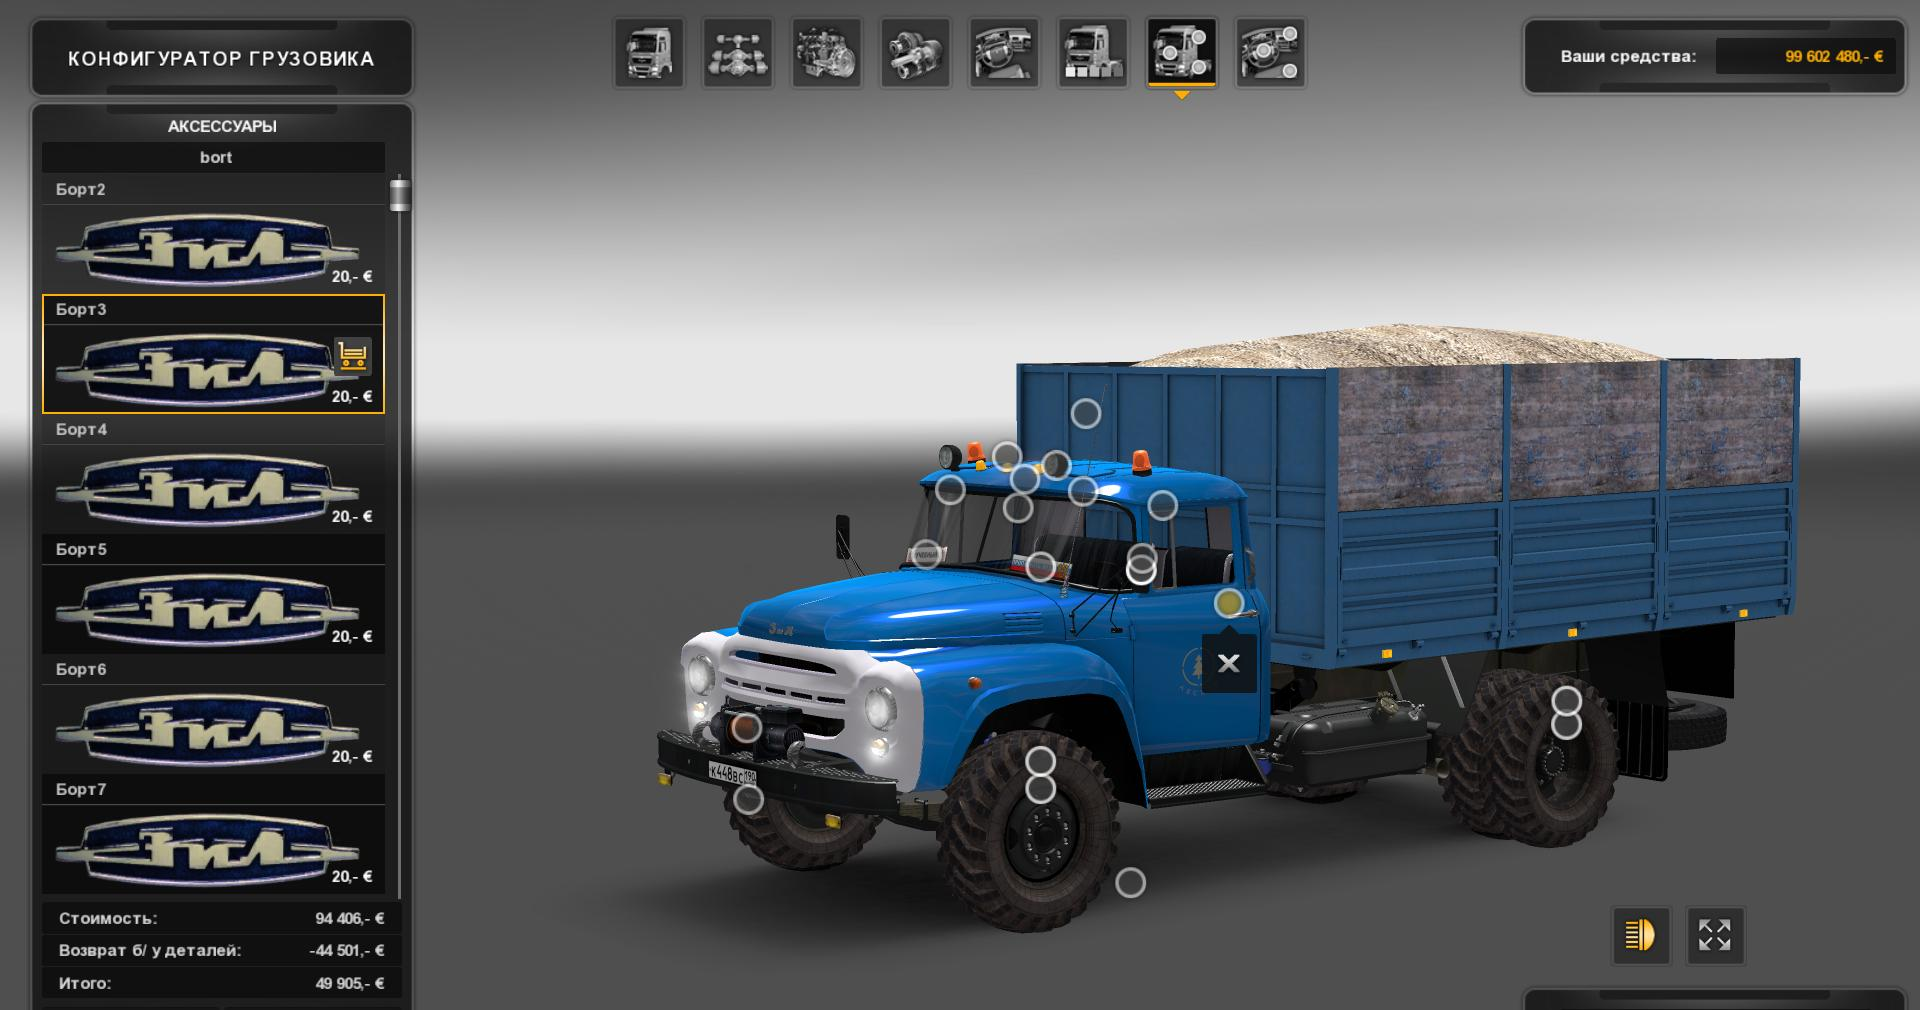 ZIL 130-131-133 [1.28.X] TRUCK MOD -Euro Truck Simulator 2 Mods on